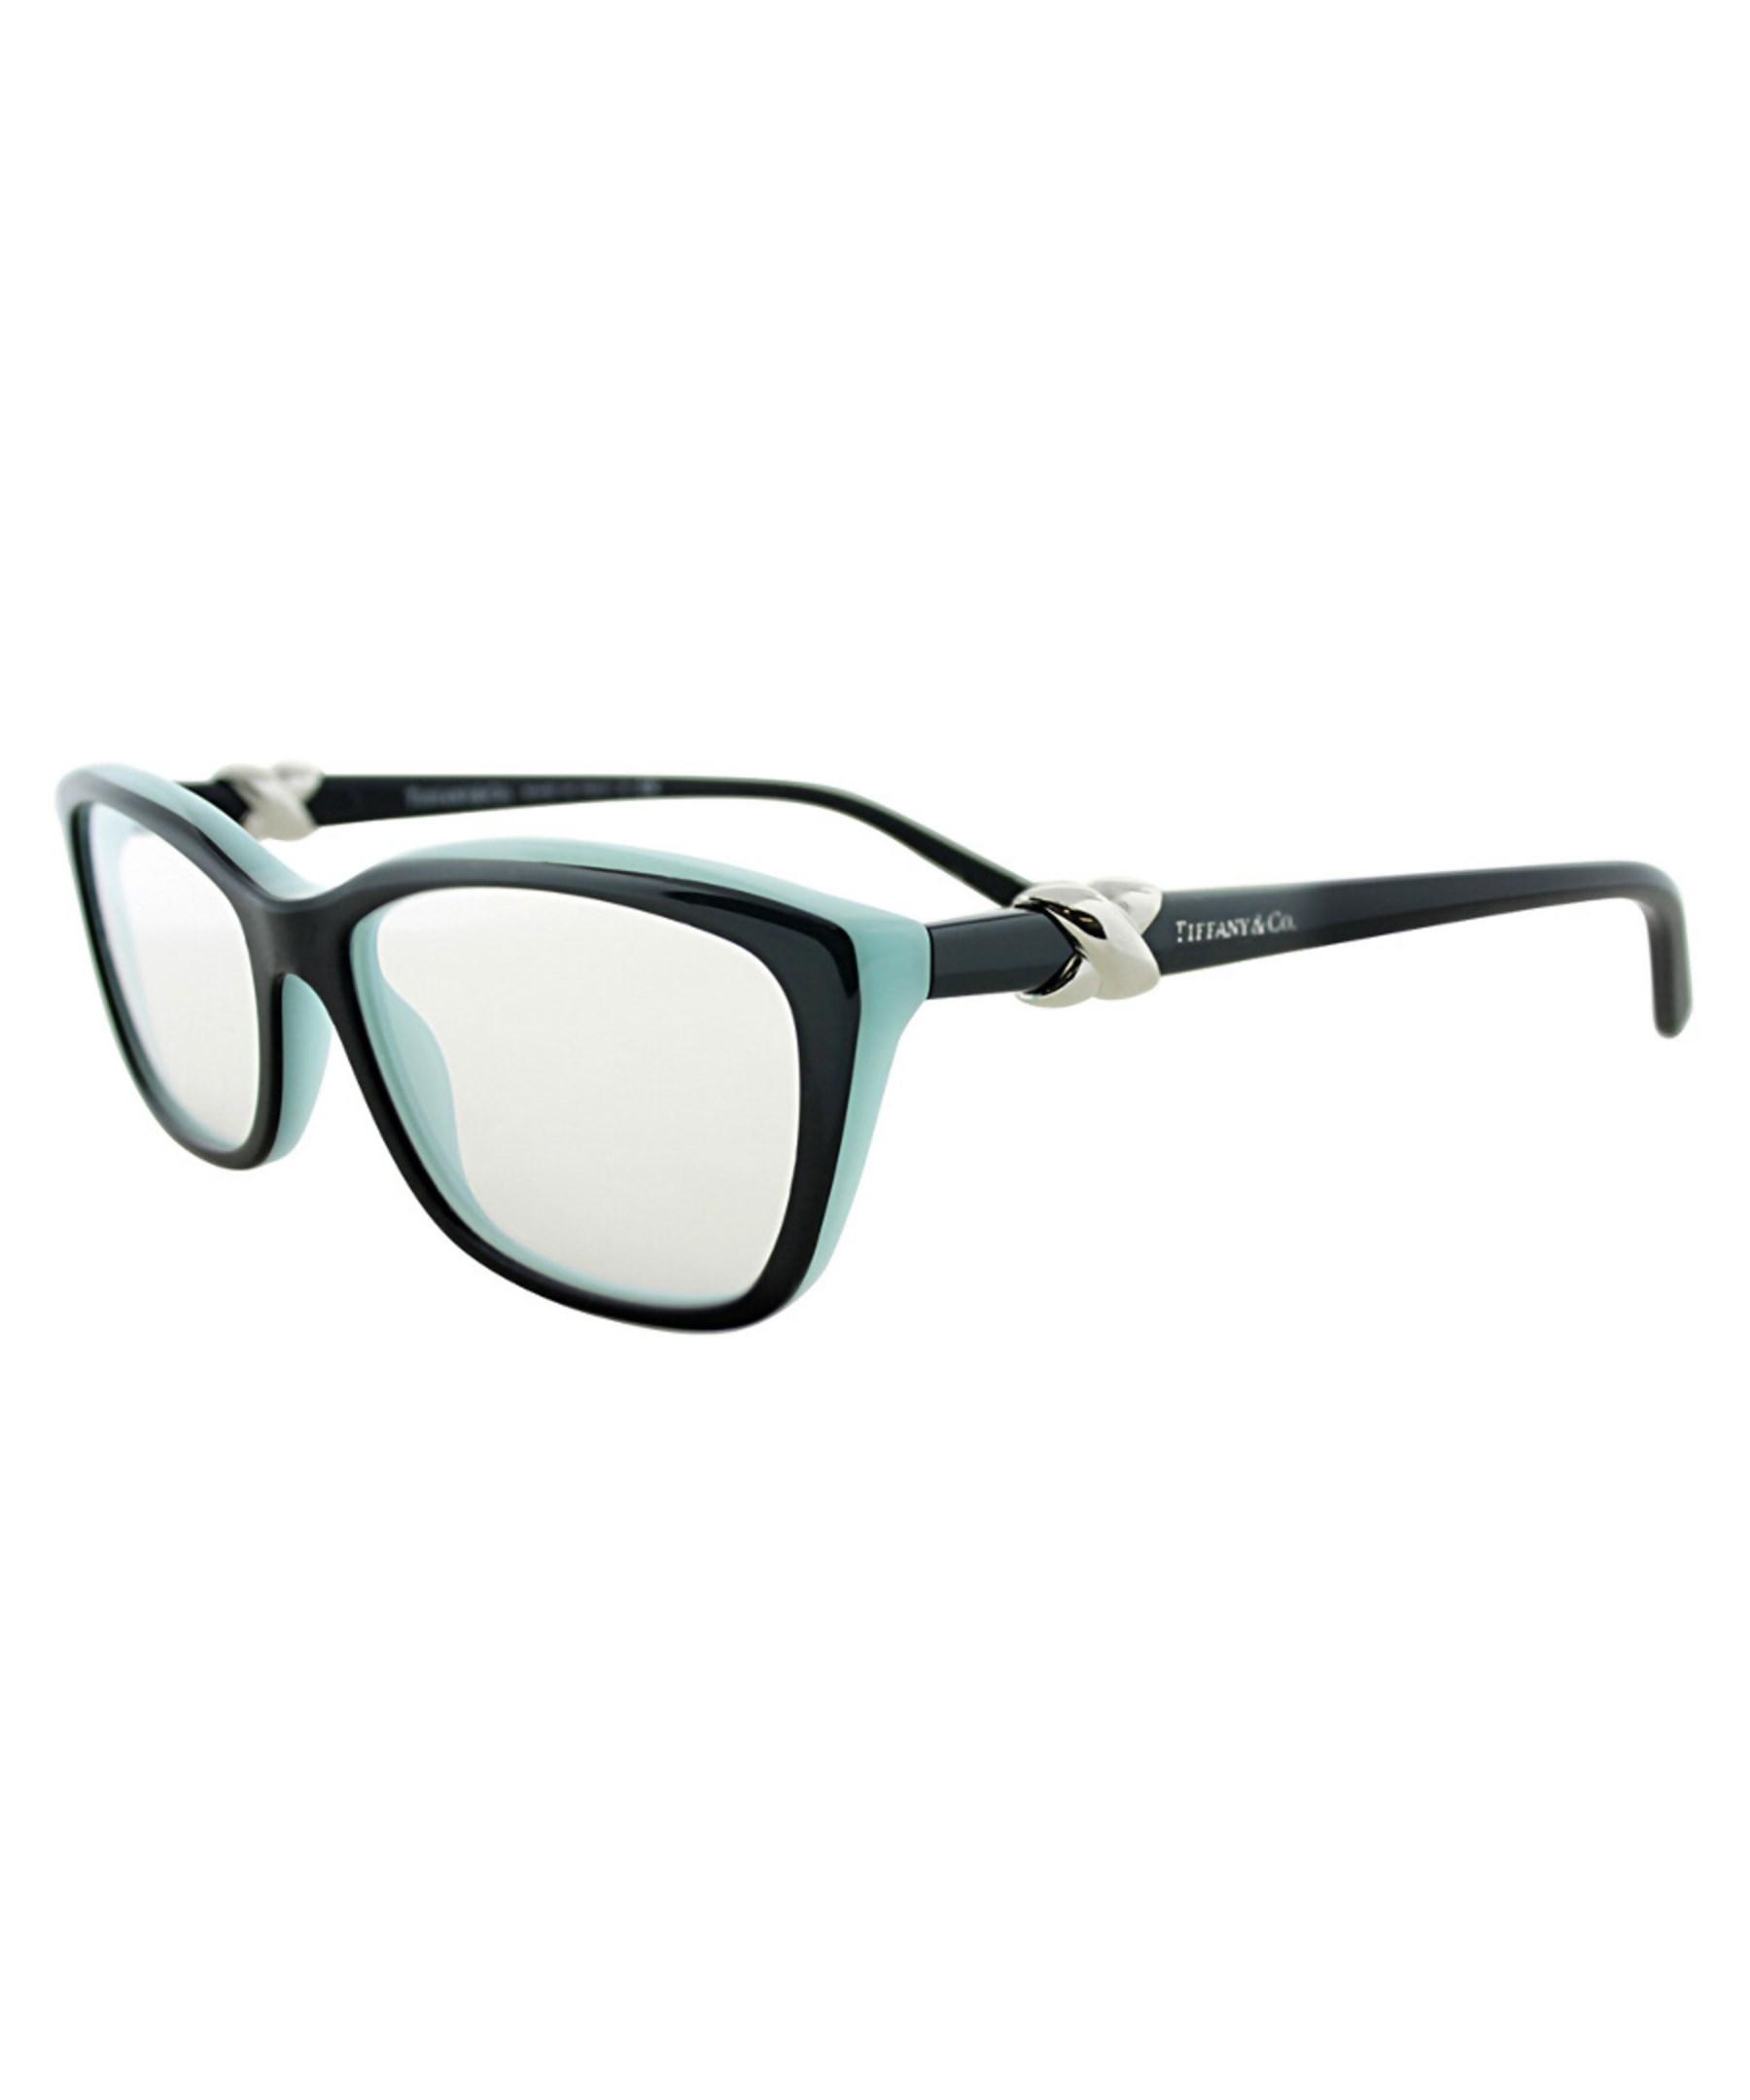 e5df0045099 Lyst - Tiffany   Co. Women s Tf 2074 8055 54mm Optical Frames